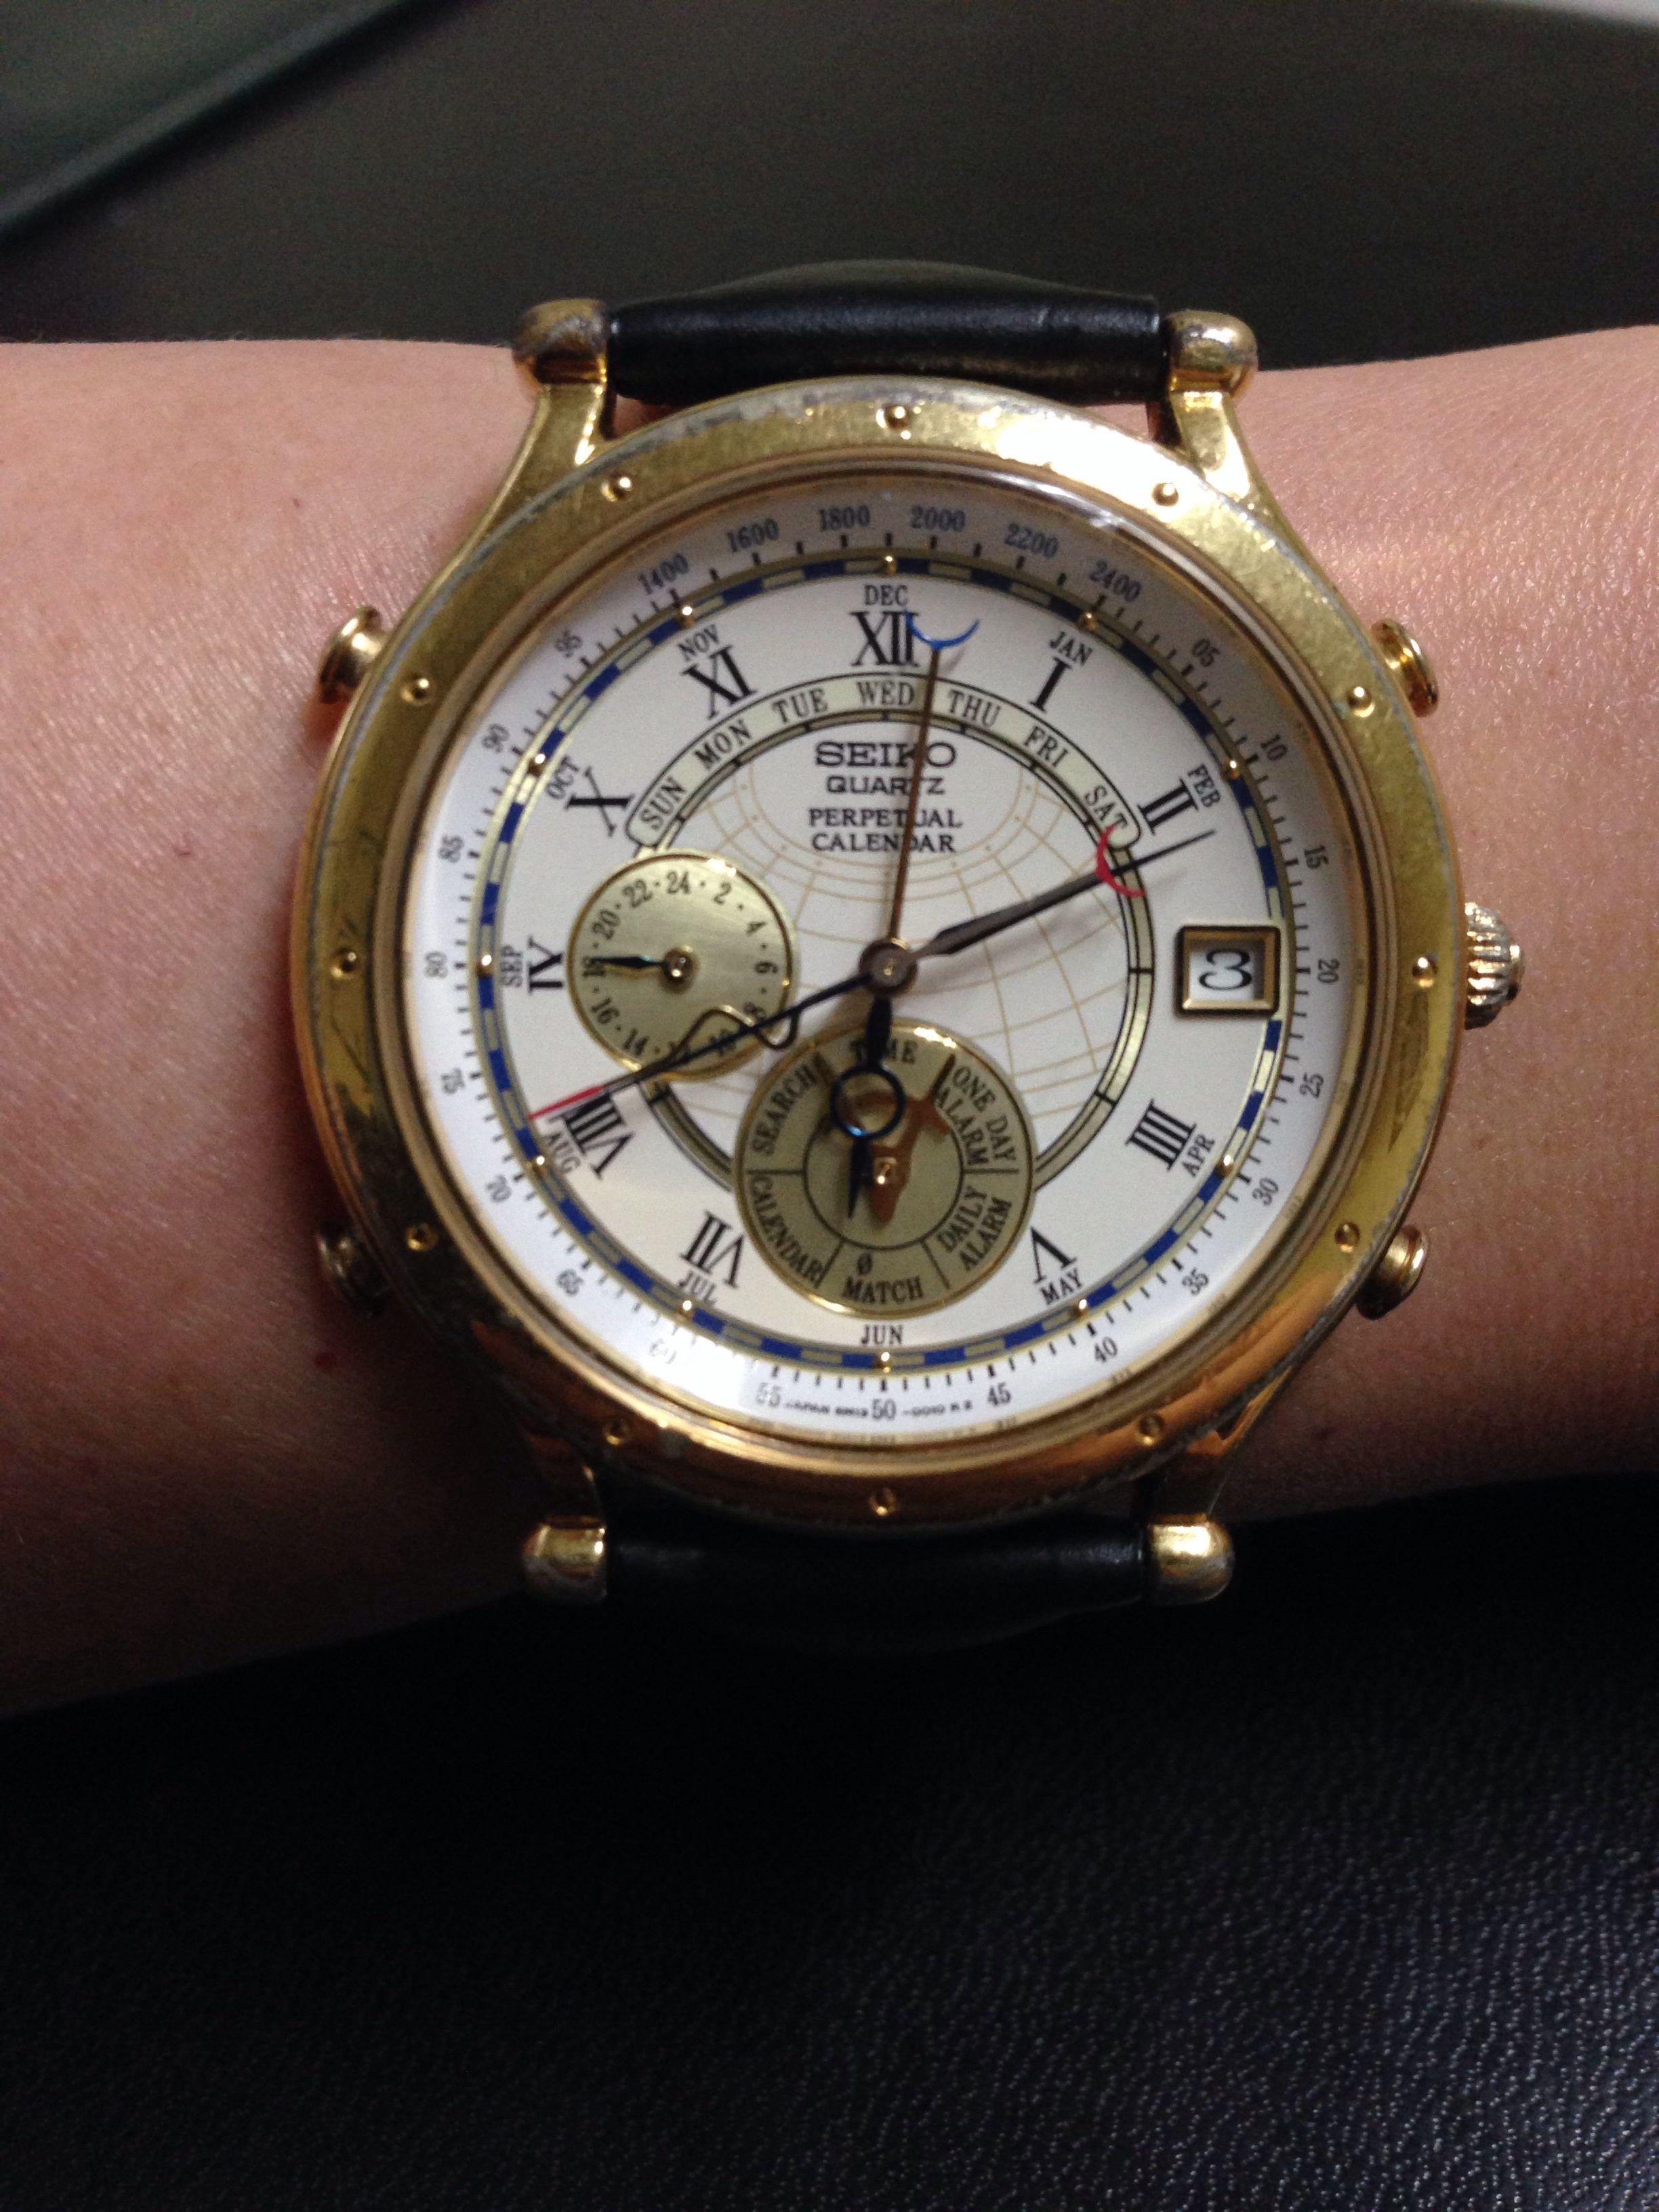 Seiko Perpetual Calendar Vintage : Seiko age of discovery perpetual calendar watch board